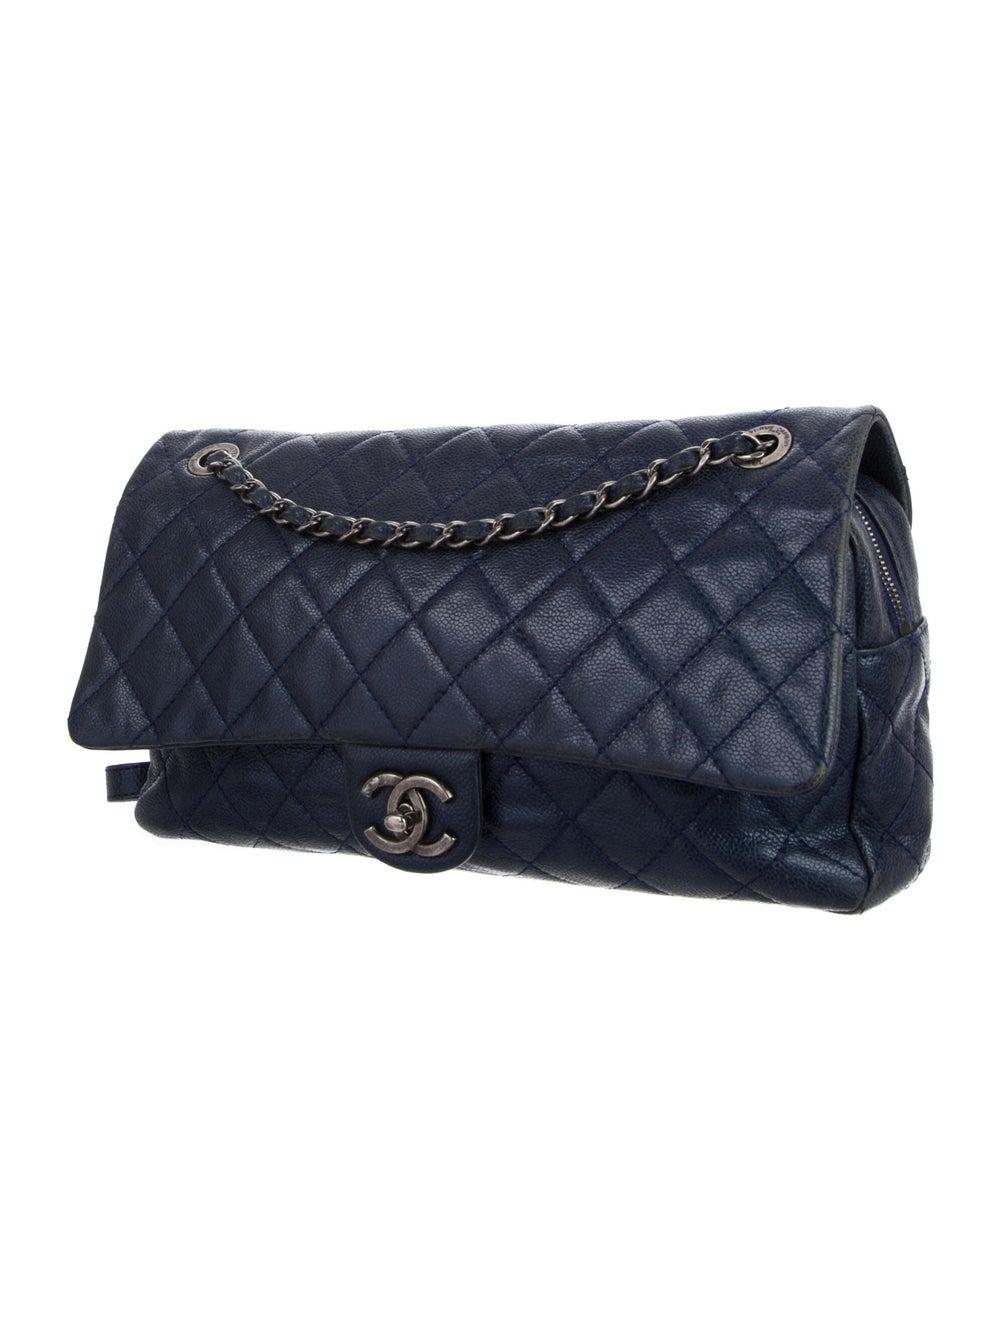 Chanel Jumbo Easy Caviar Flap Bag Blue - image 3